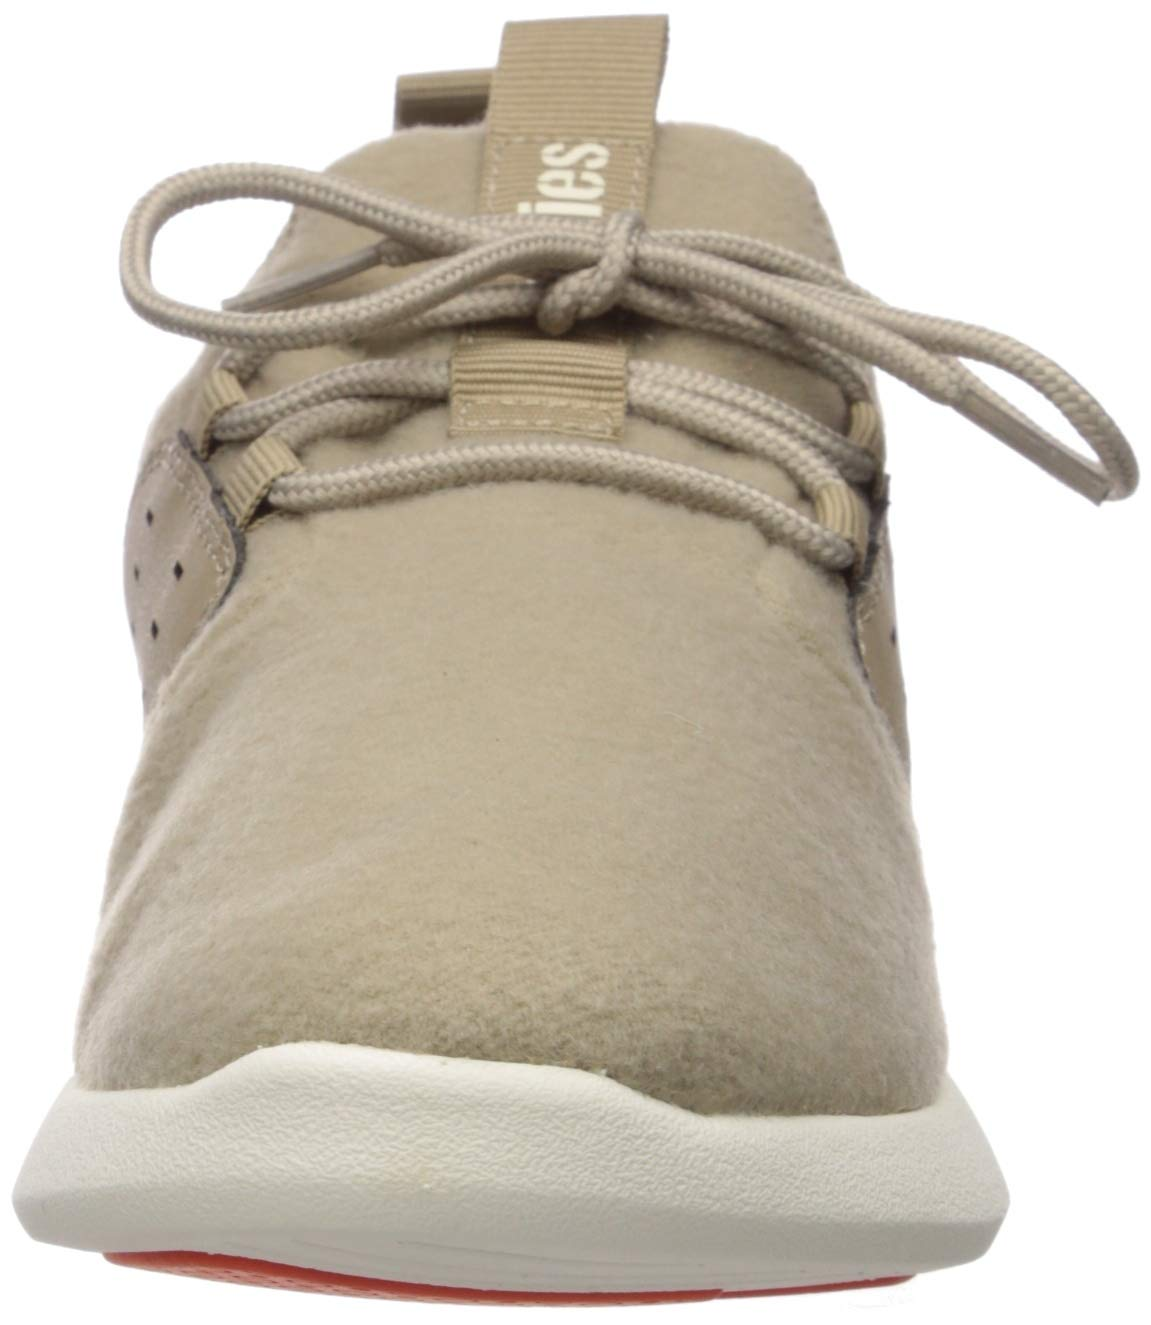 Etnies Mens Vanguard Skate Shoe Grey 9.5 Medium US 4101000497